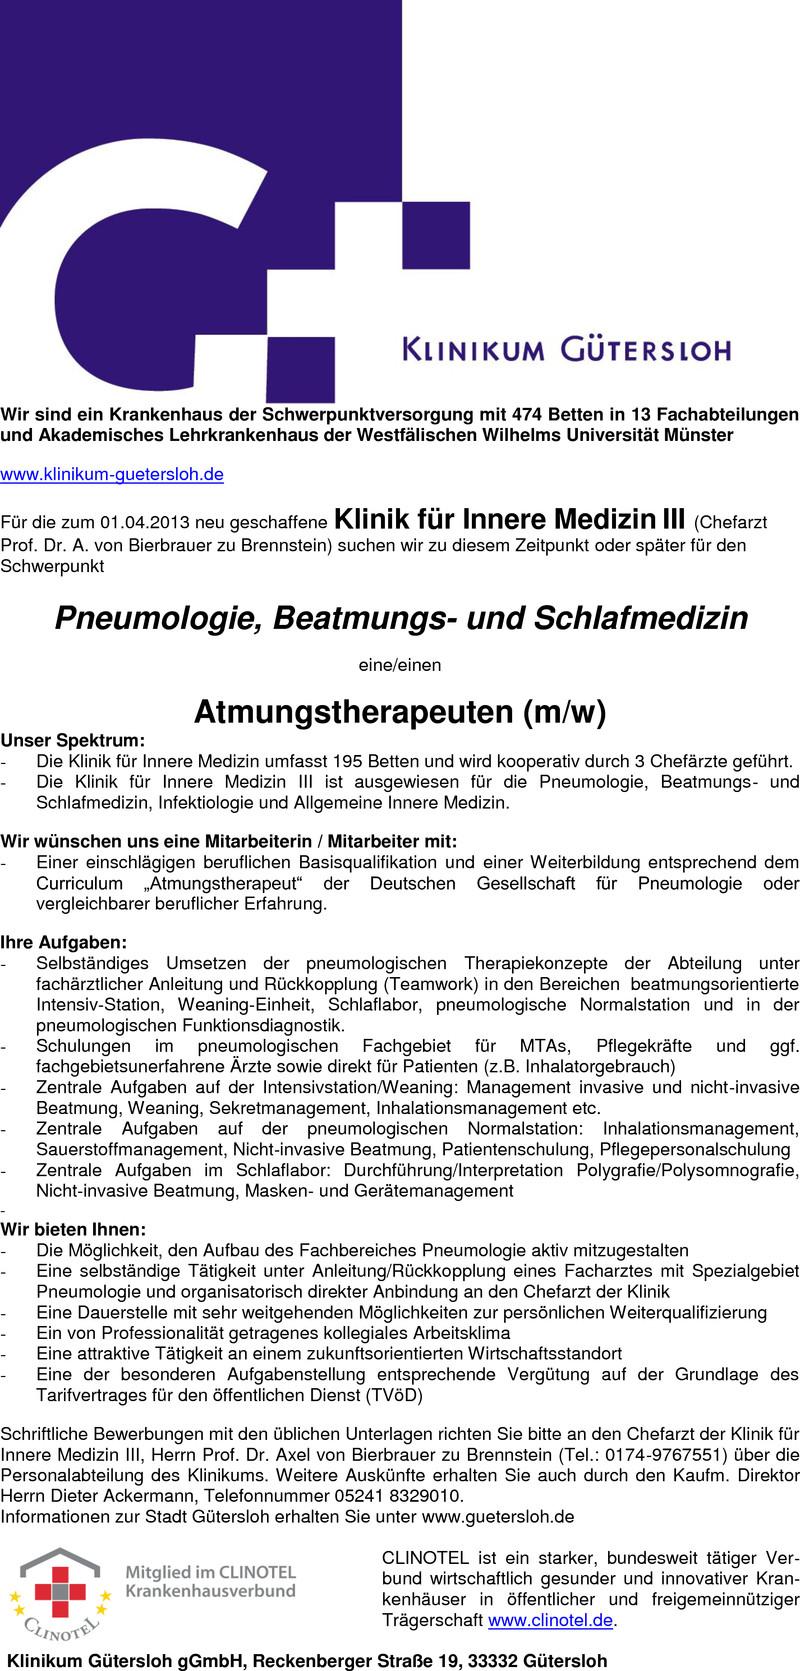 Stellenangebot Atmungstherapeuten (m/w) in Gütersloh - Job